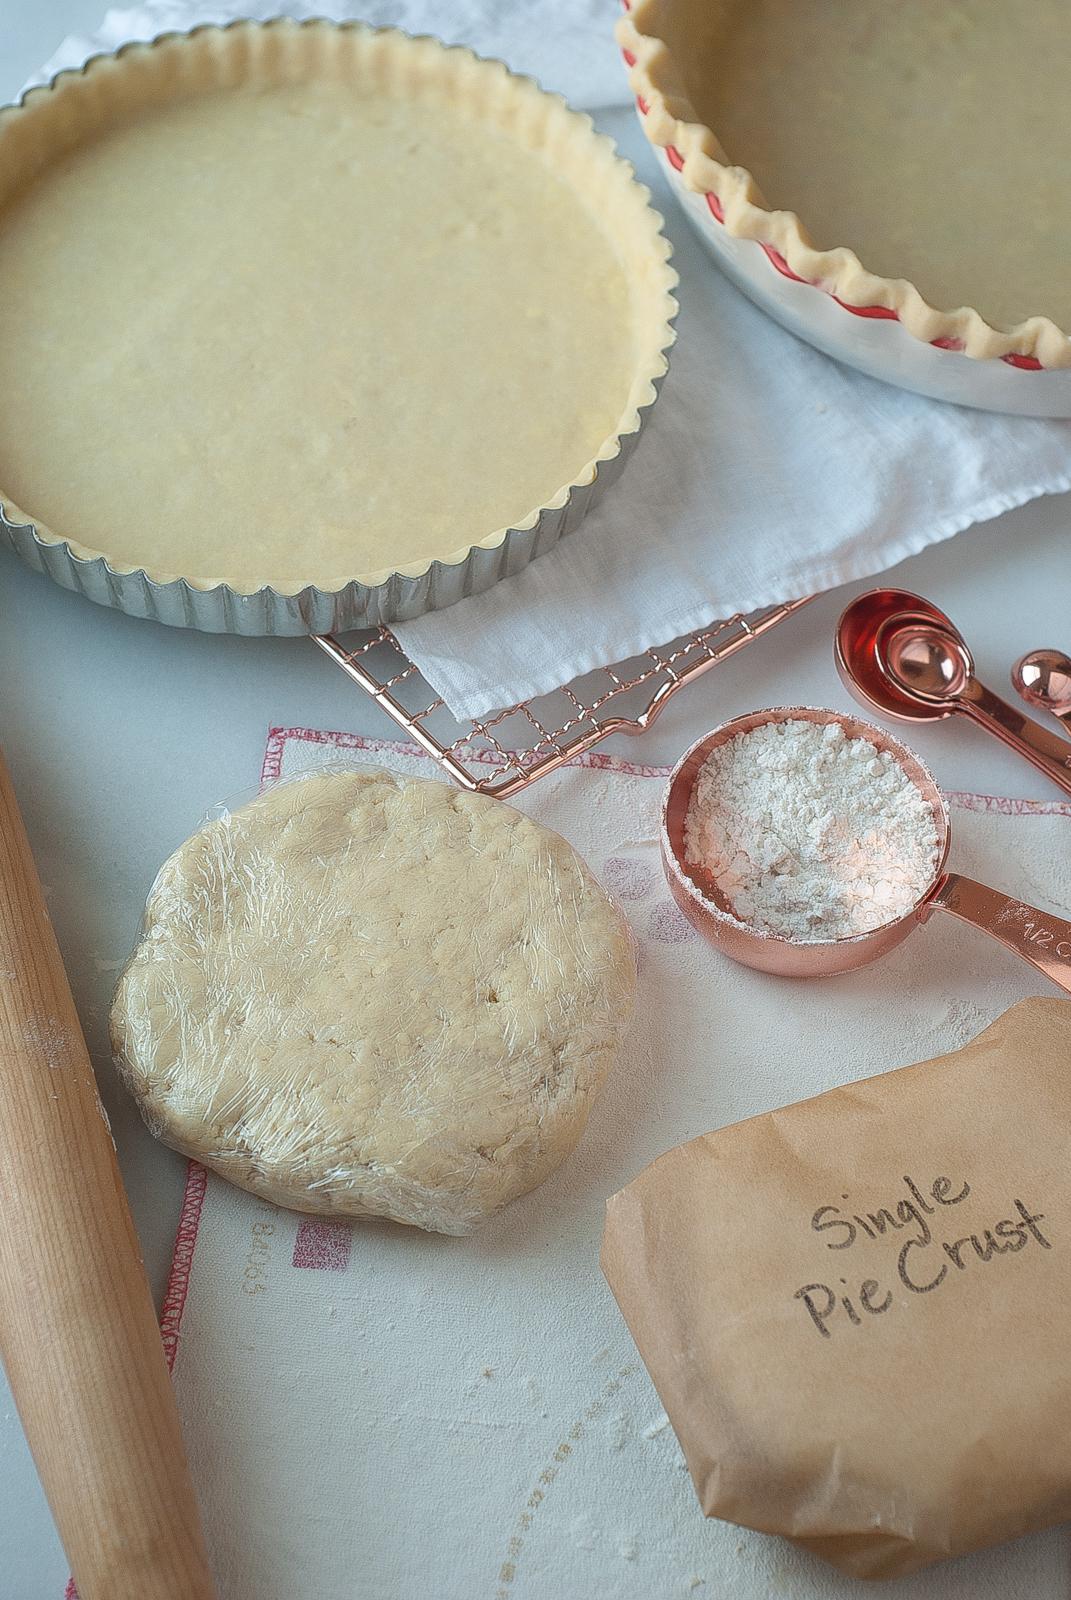 Pie Crust 101 Tutorial - Simply So Good